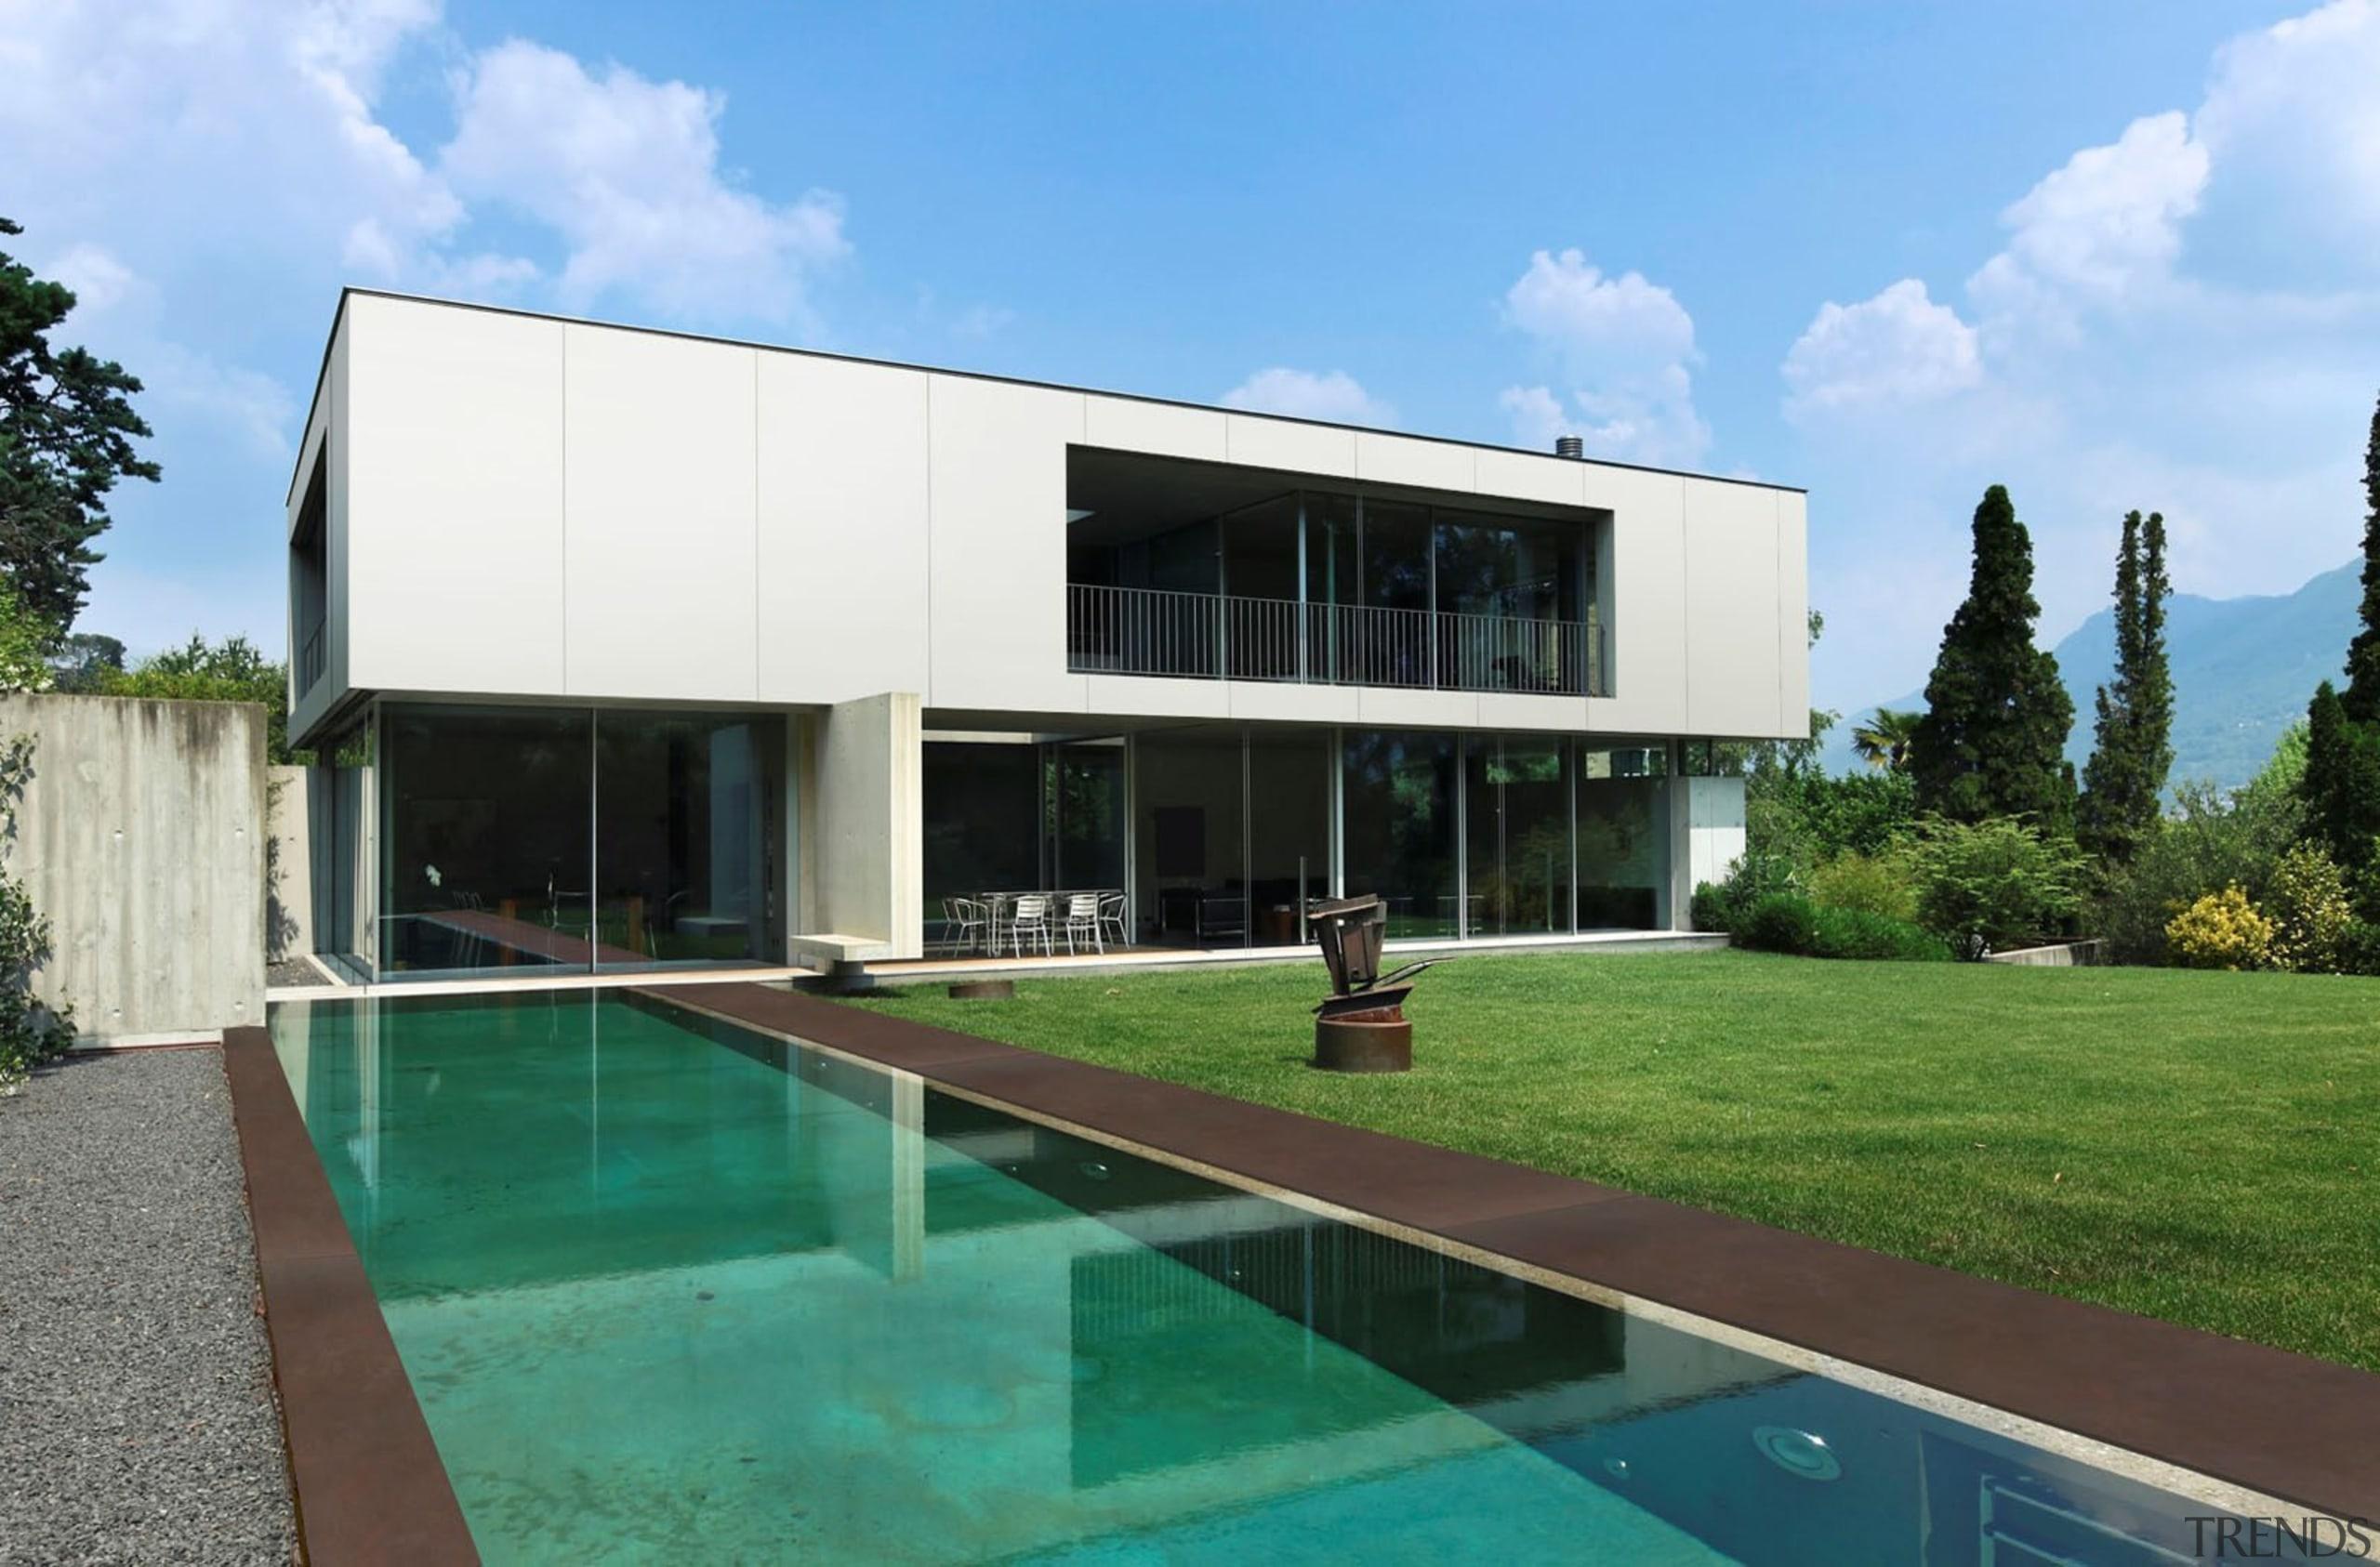 ZENITH & KADUM - ZENITH & KADUM - architecture, estate, facade, home, house, property, real estate, residential area, swimming pool, villa, teal